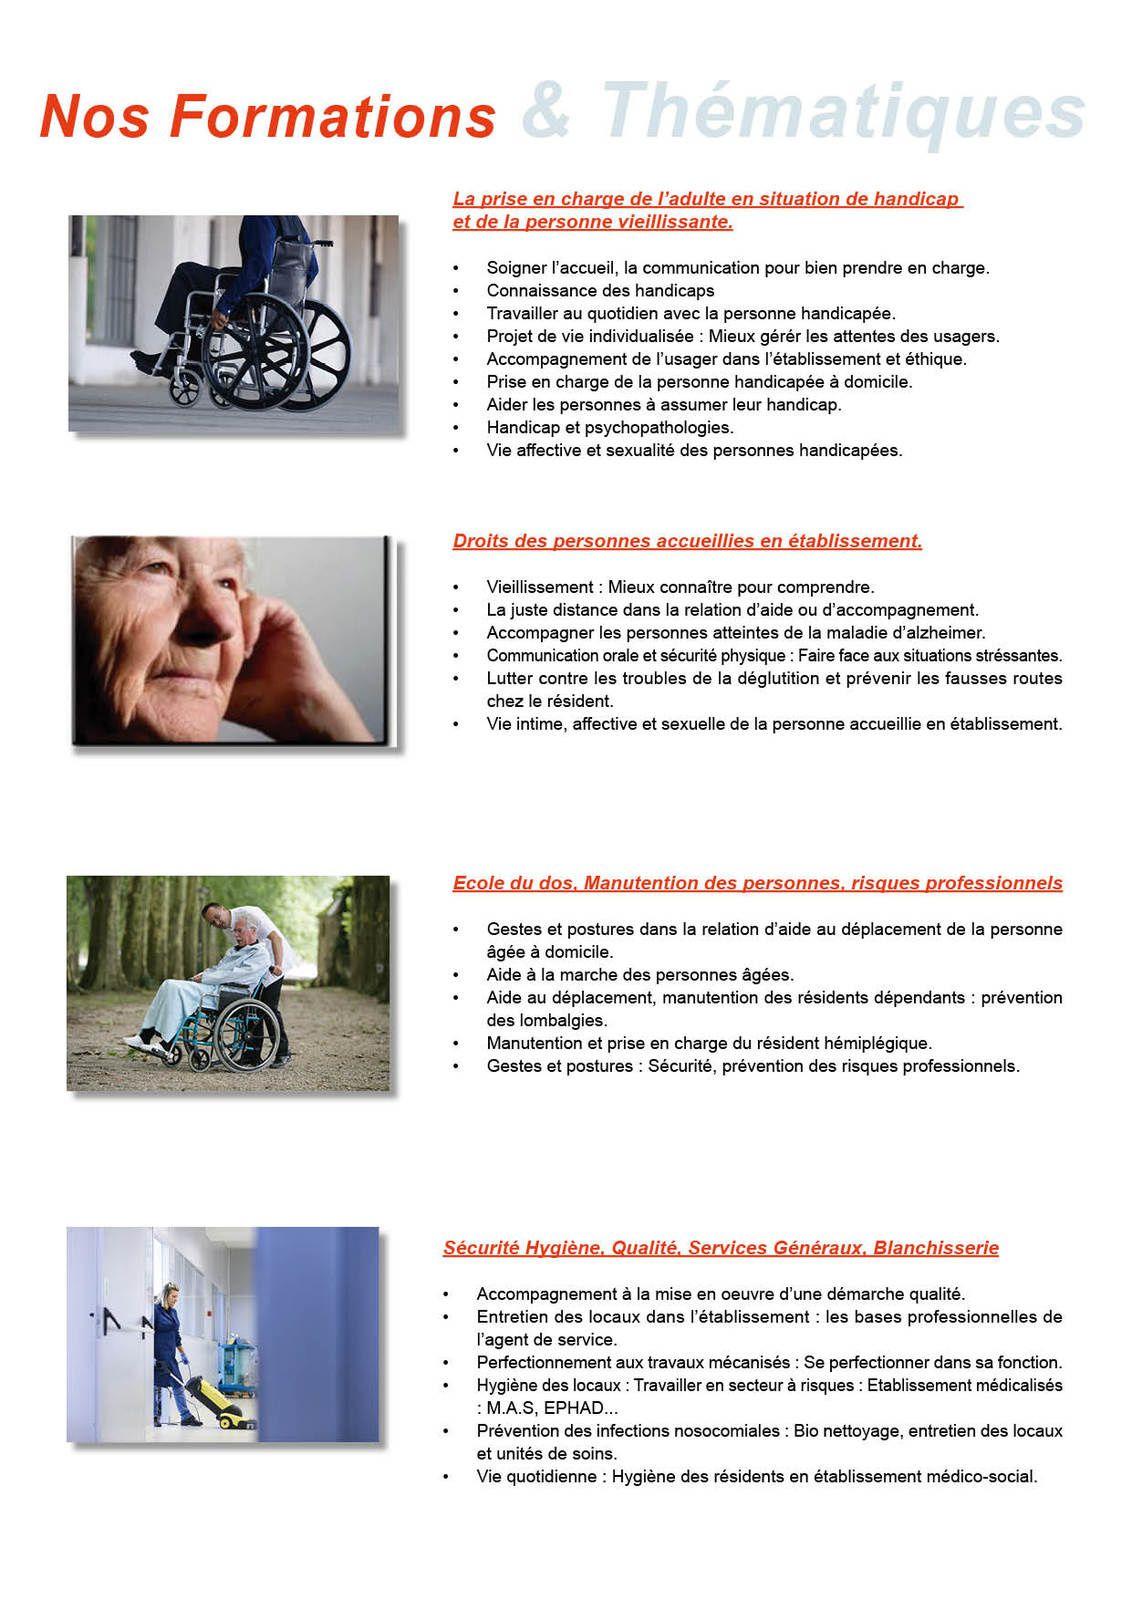 ORES FORMATIONS  Sanitaire et Social